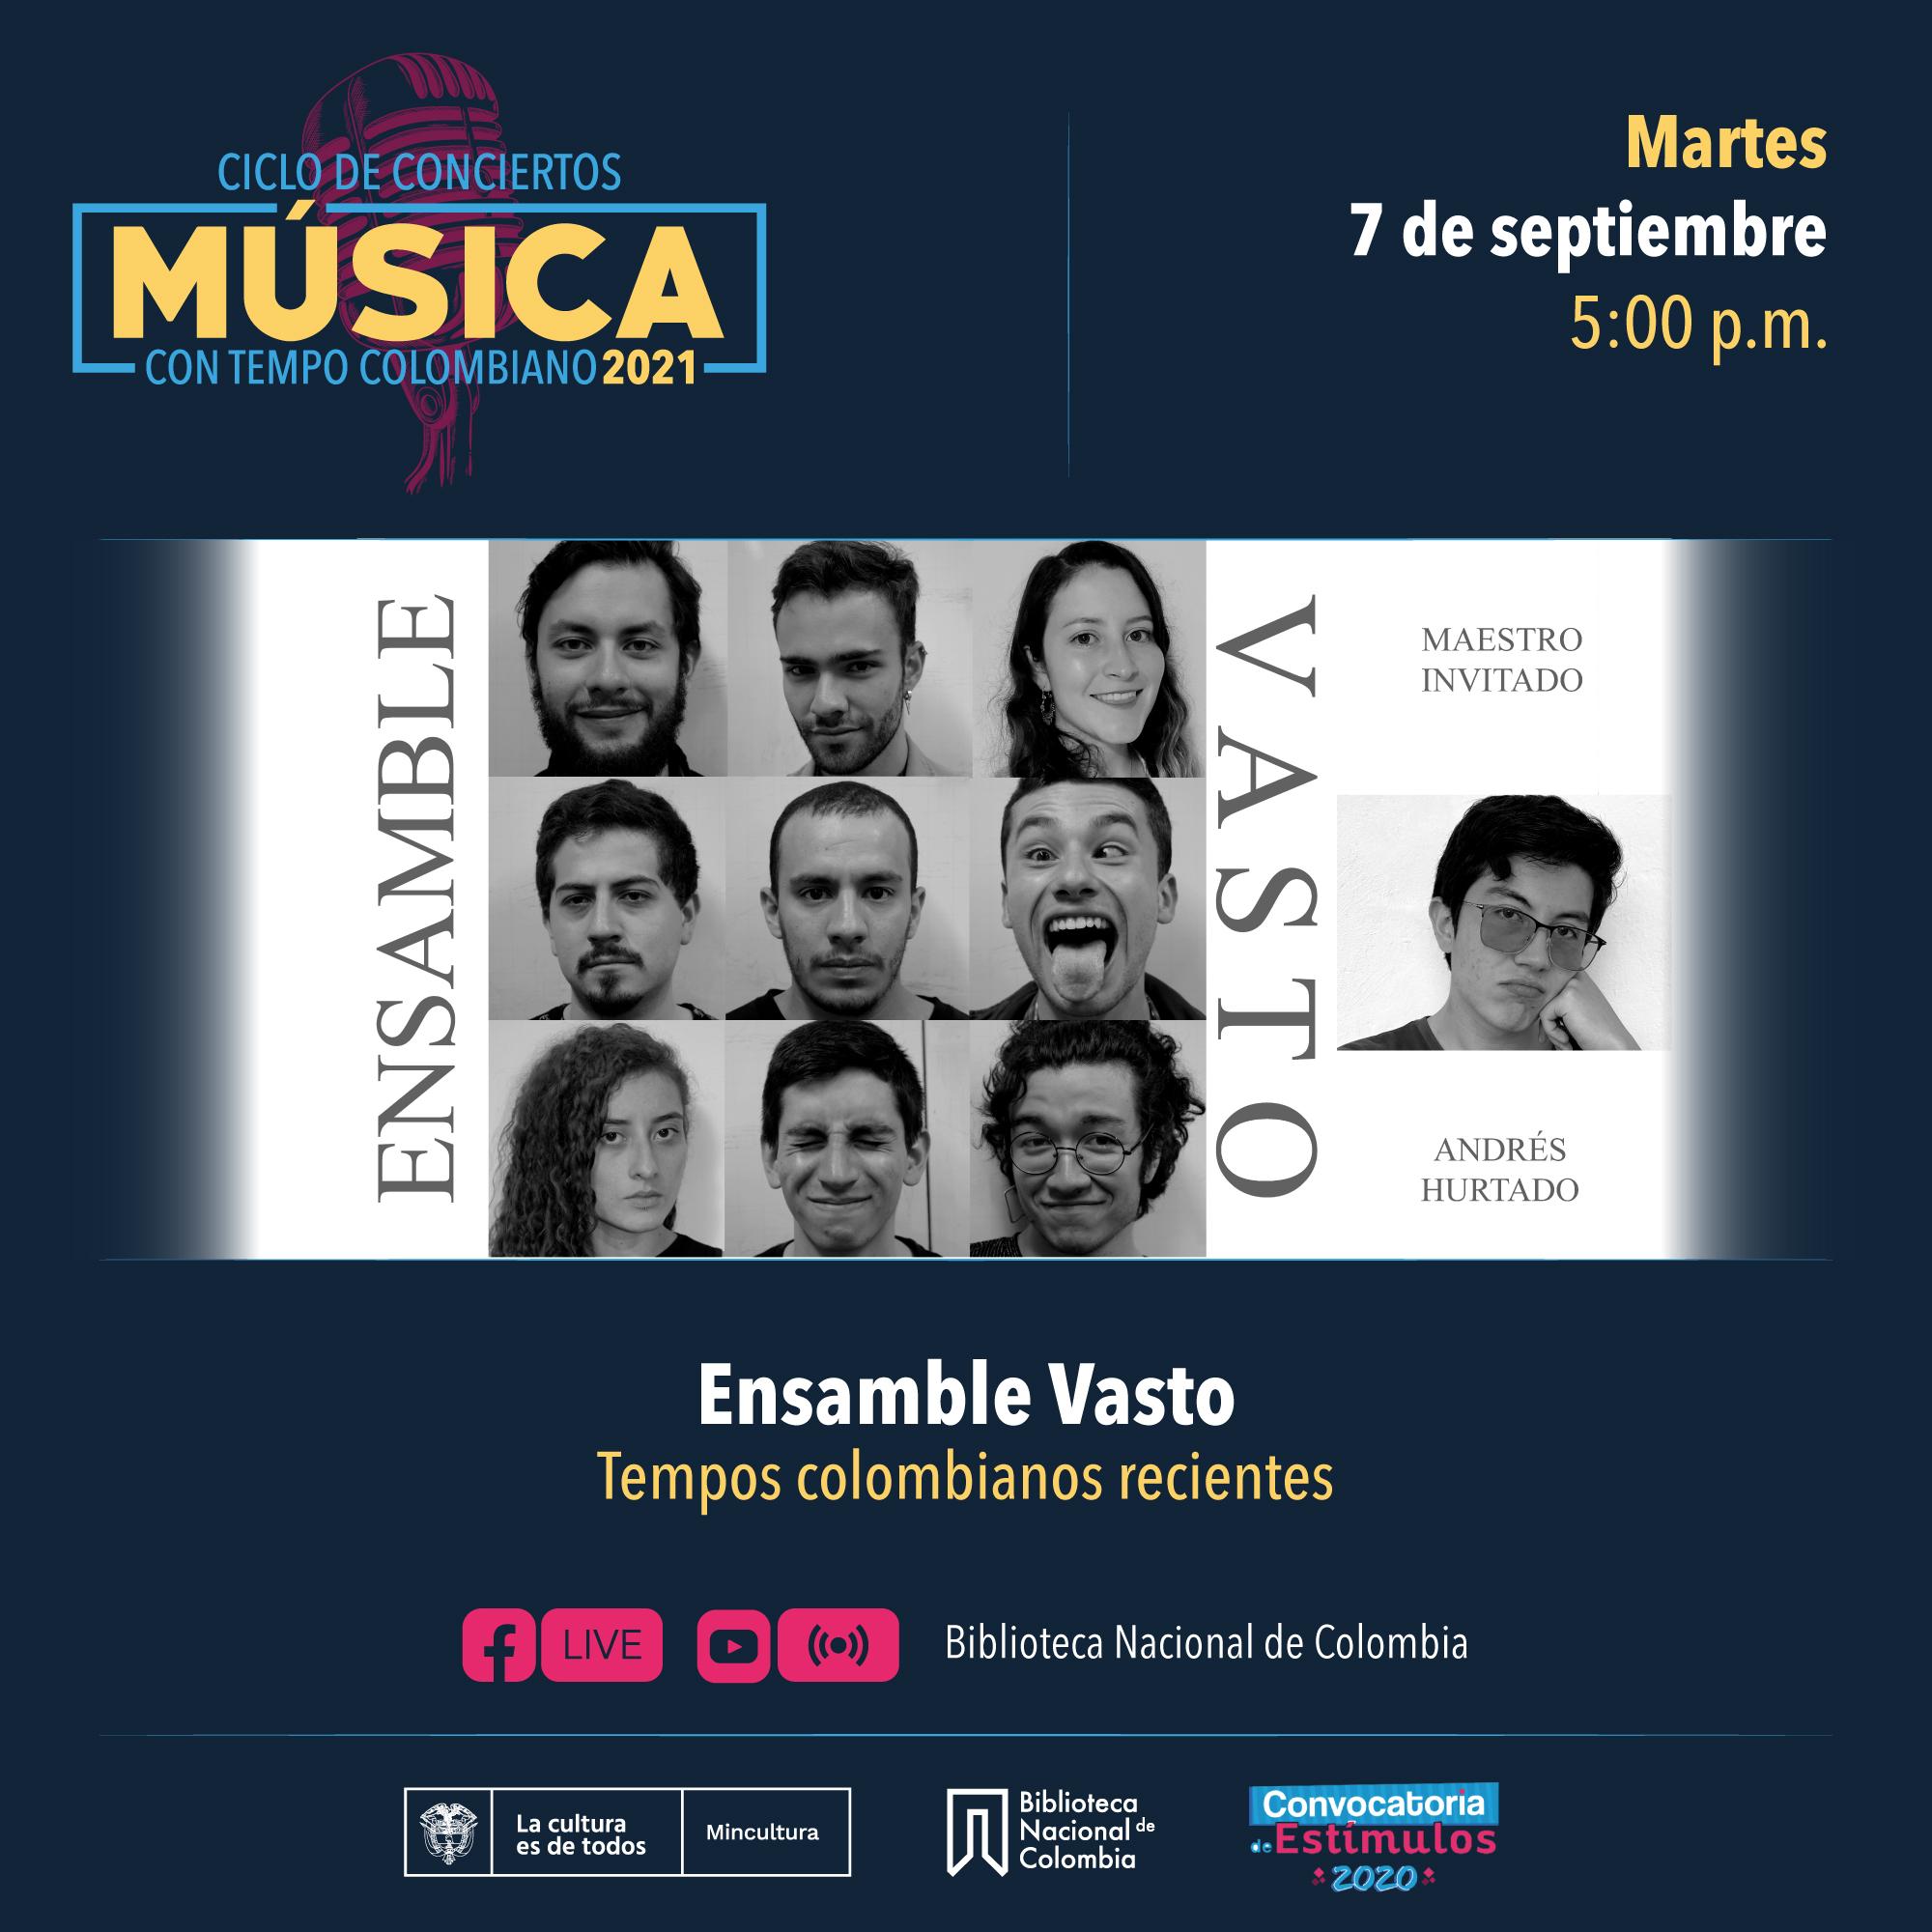 Música Con Tempo Colombiano: Ensamble Vasto